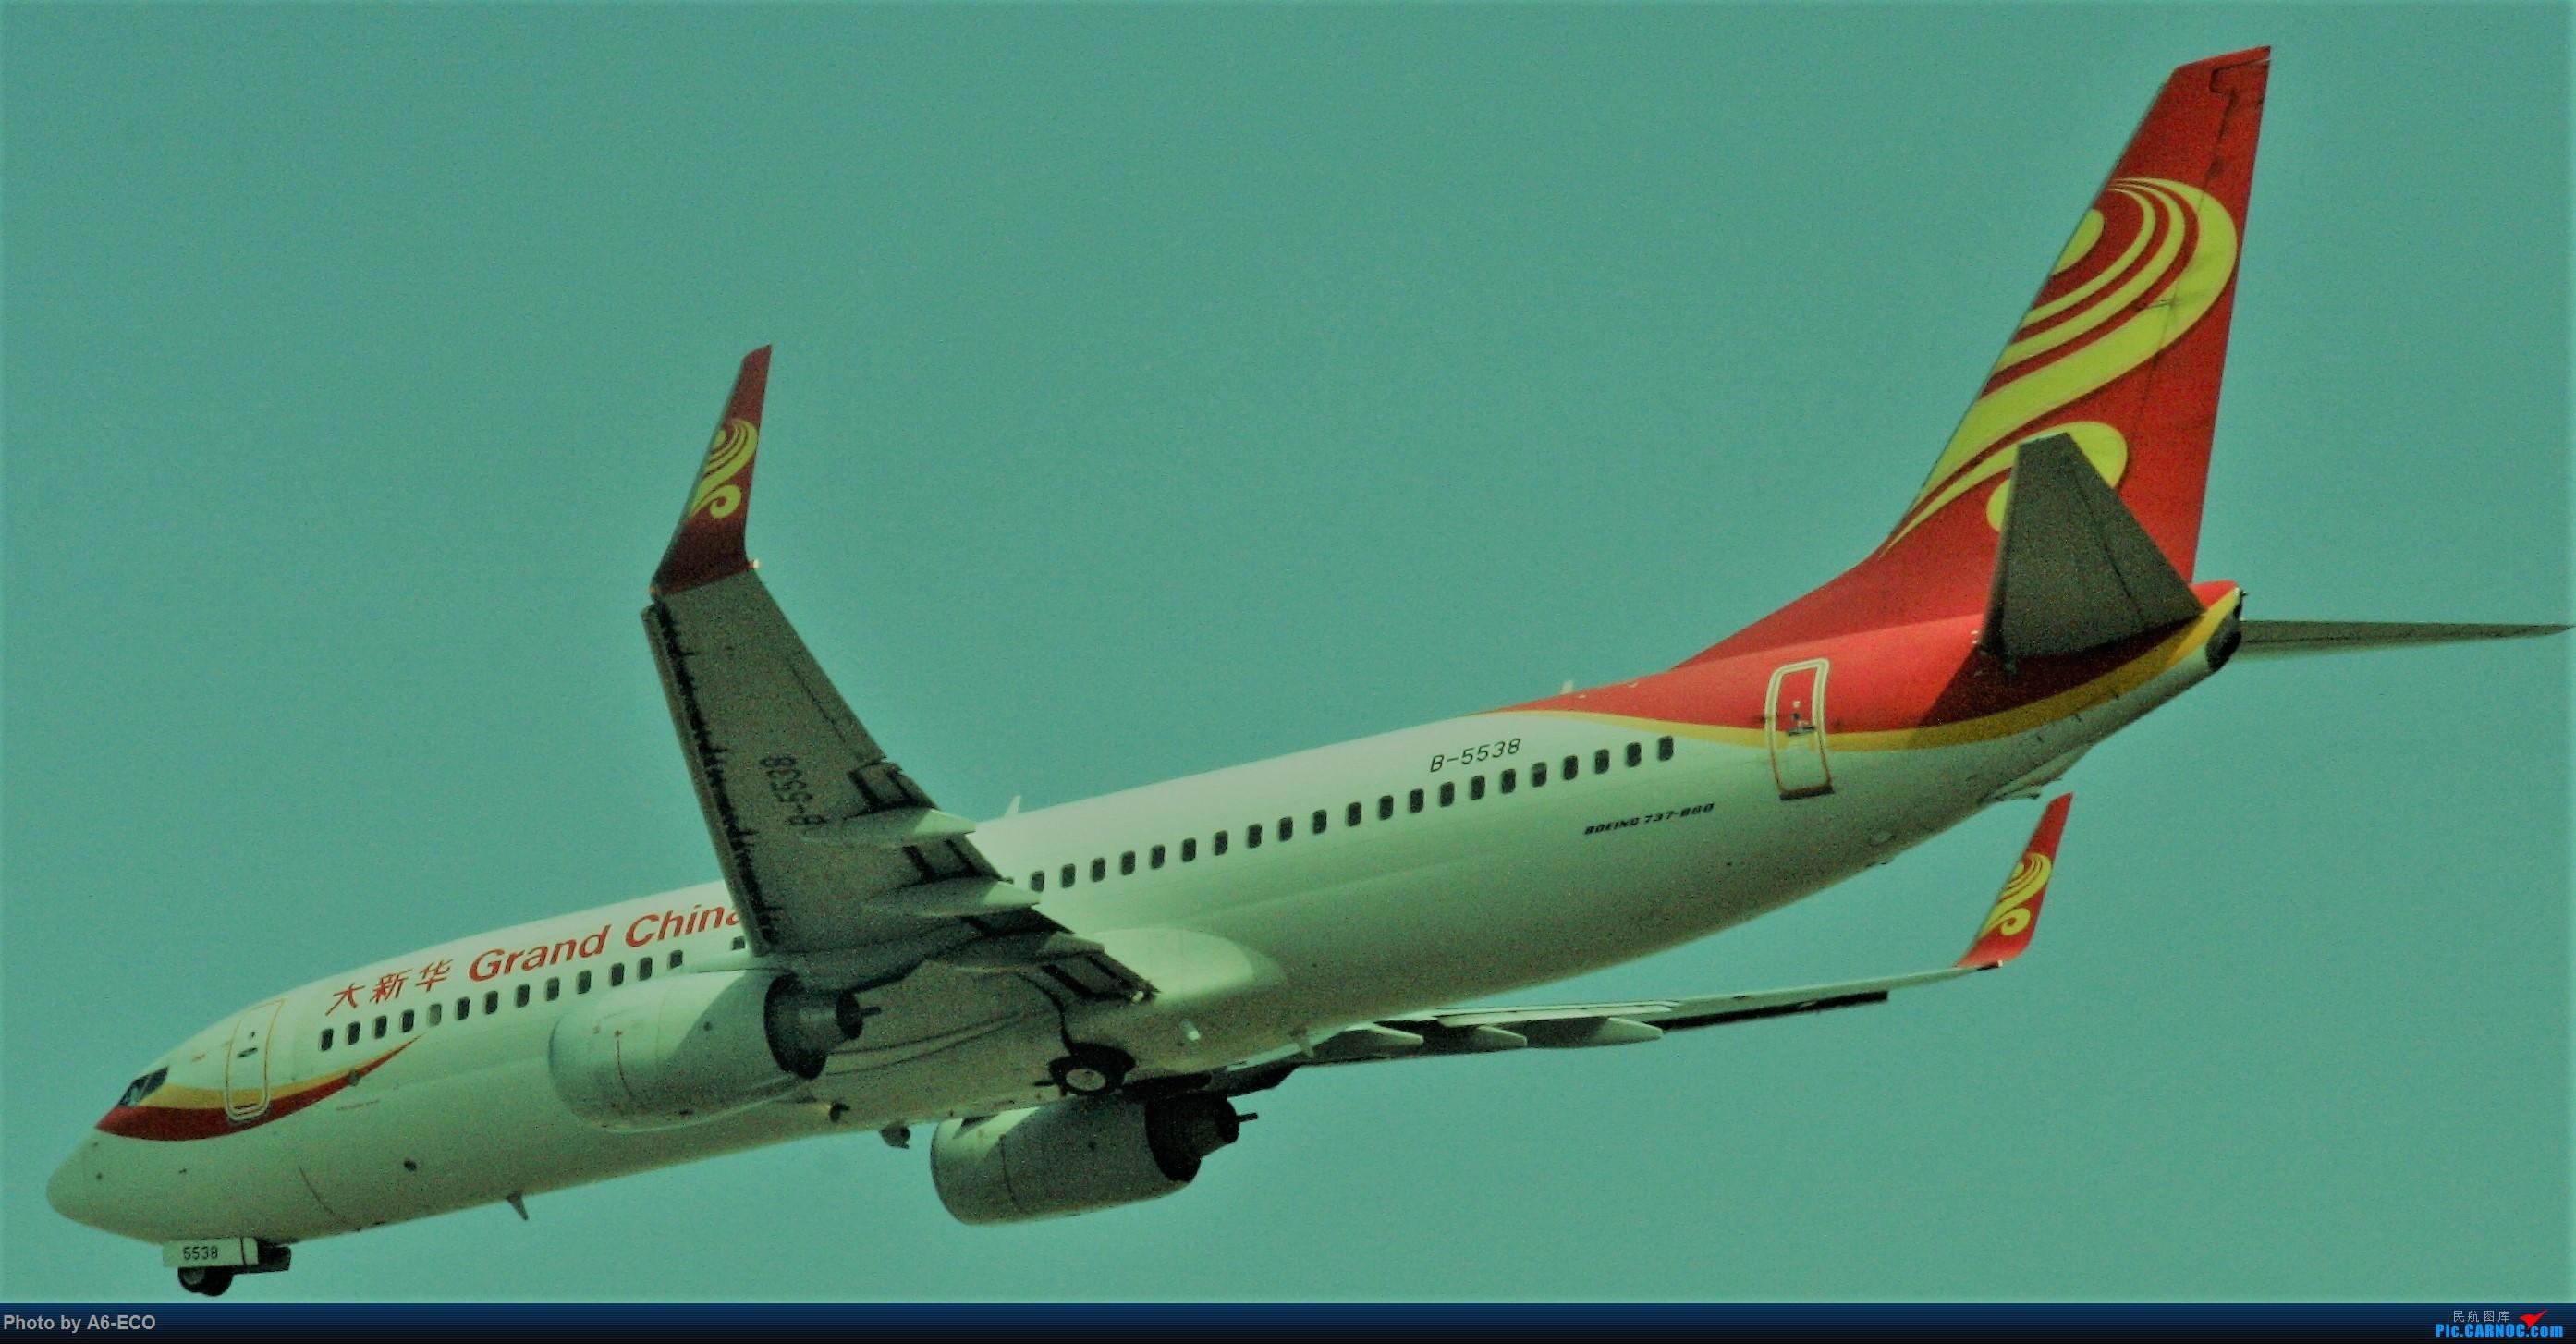 Re:[原创]今天运气极好,云南孔雀,B-1070,2个菜航邮戳,泡菜航彩绘,东航邮戳...... BOEING 737-800 B-5538 中国北京首都国际机场